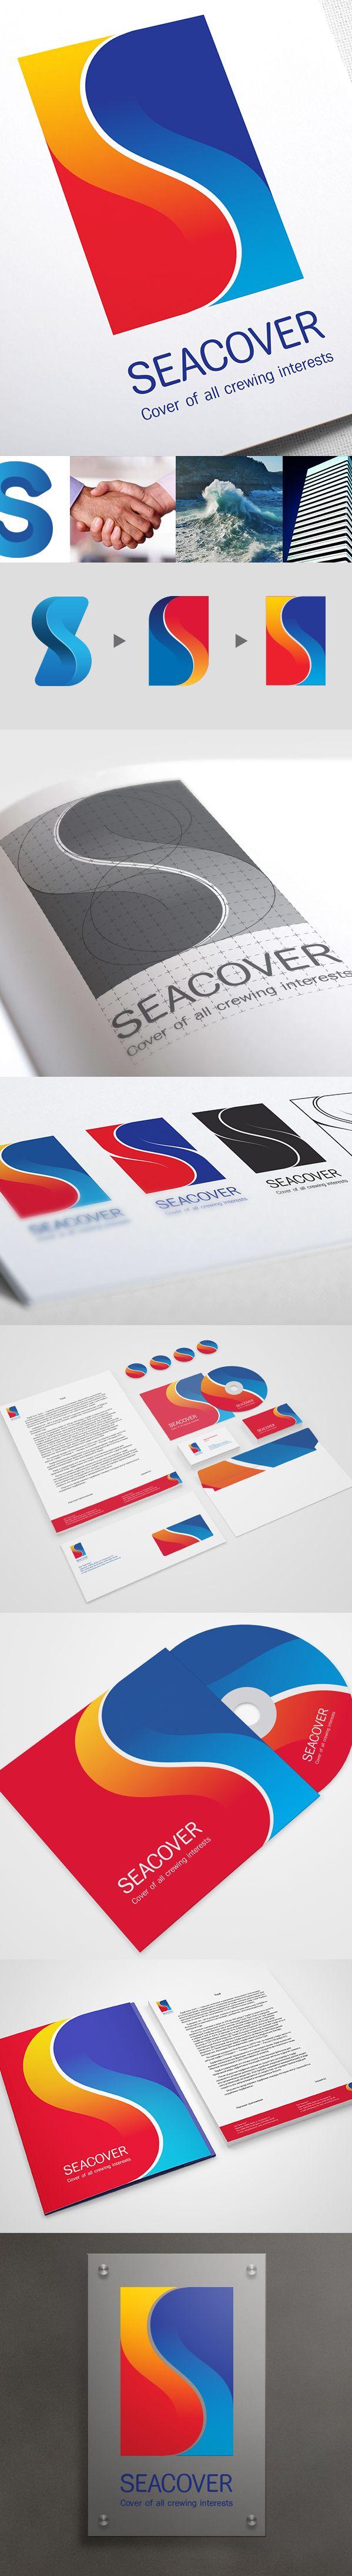 Best 25+ Blank business cards ideas on Pinterest | Diy straw, DIY ...